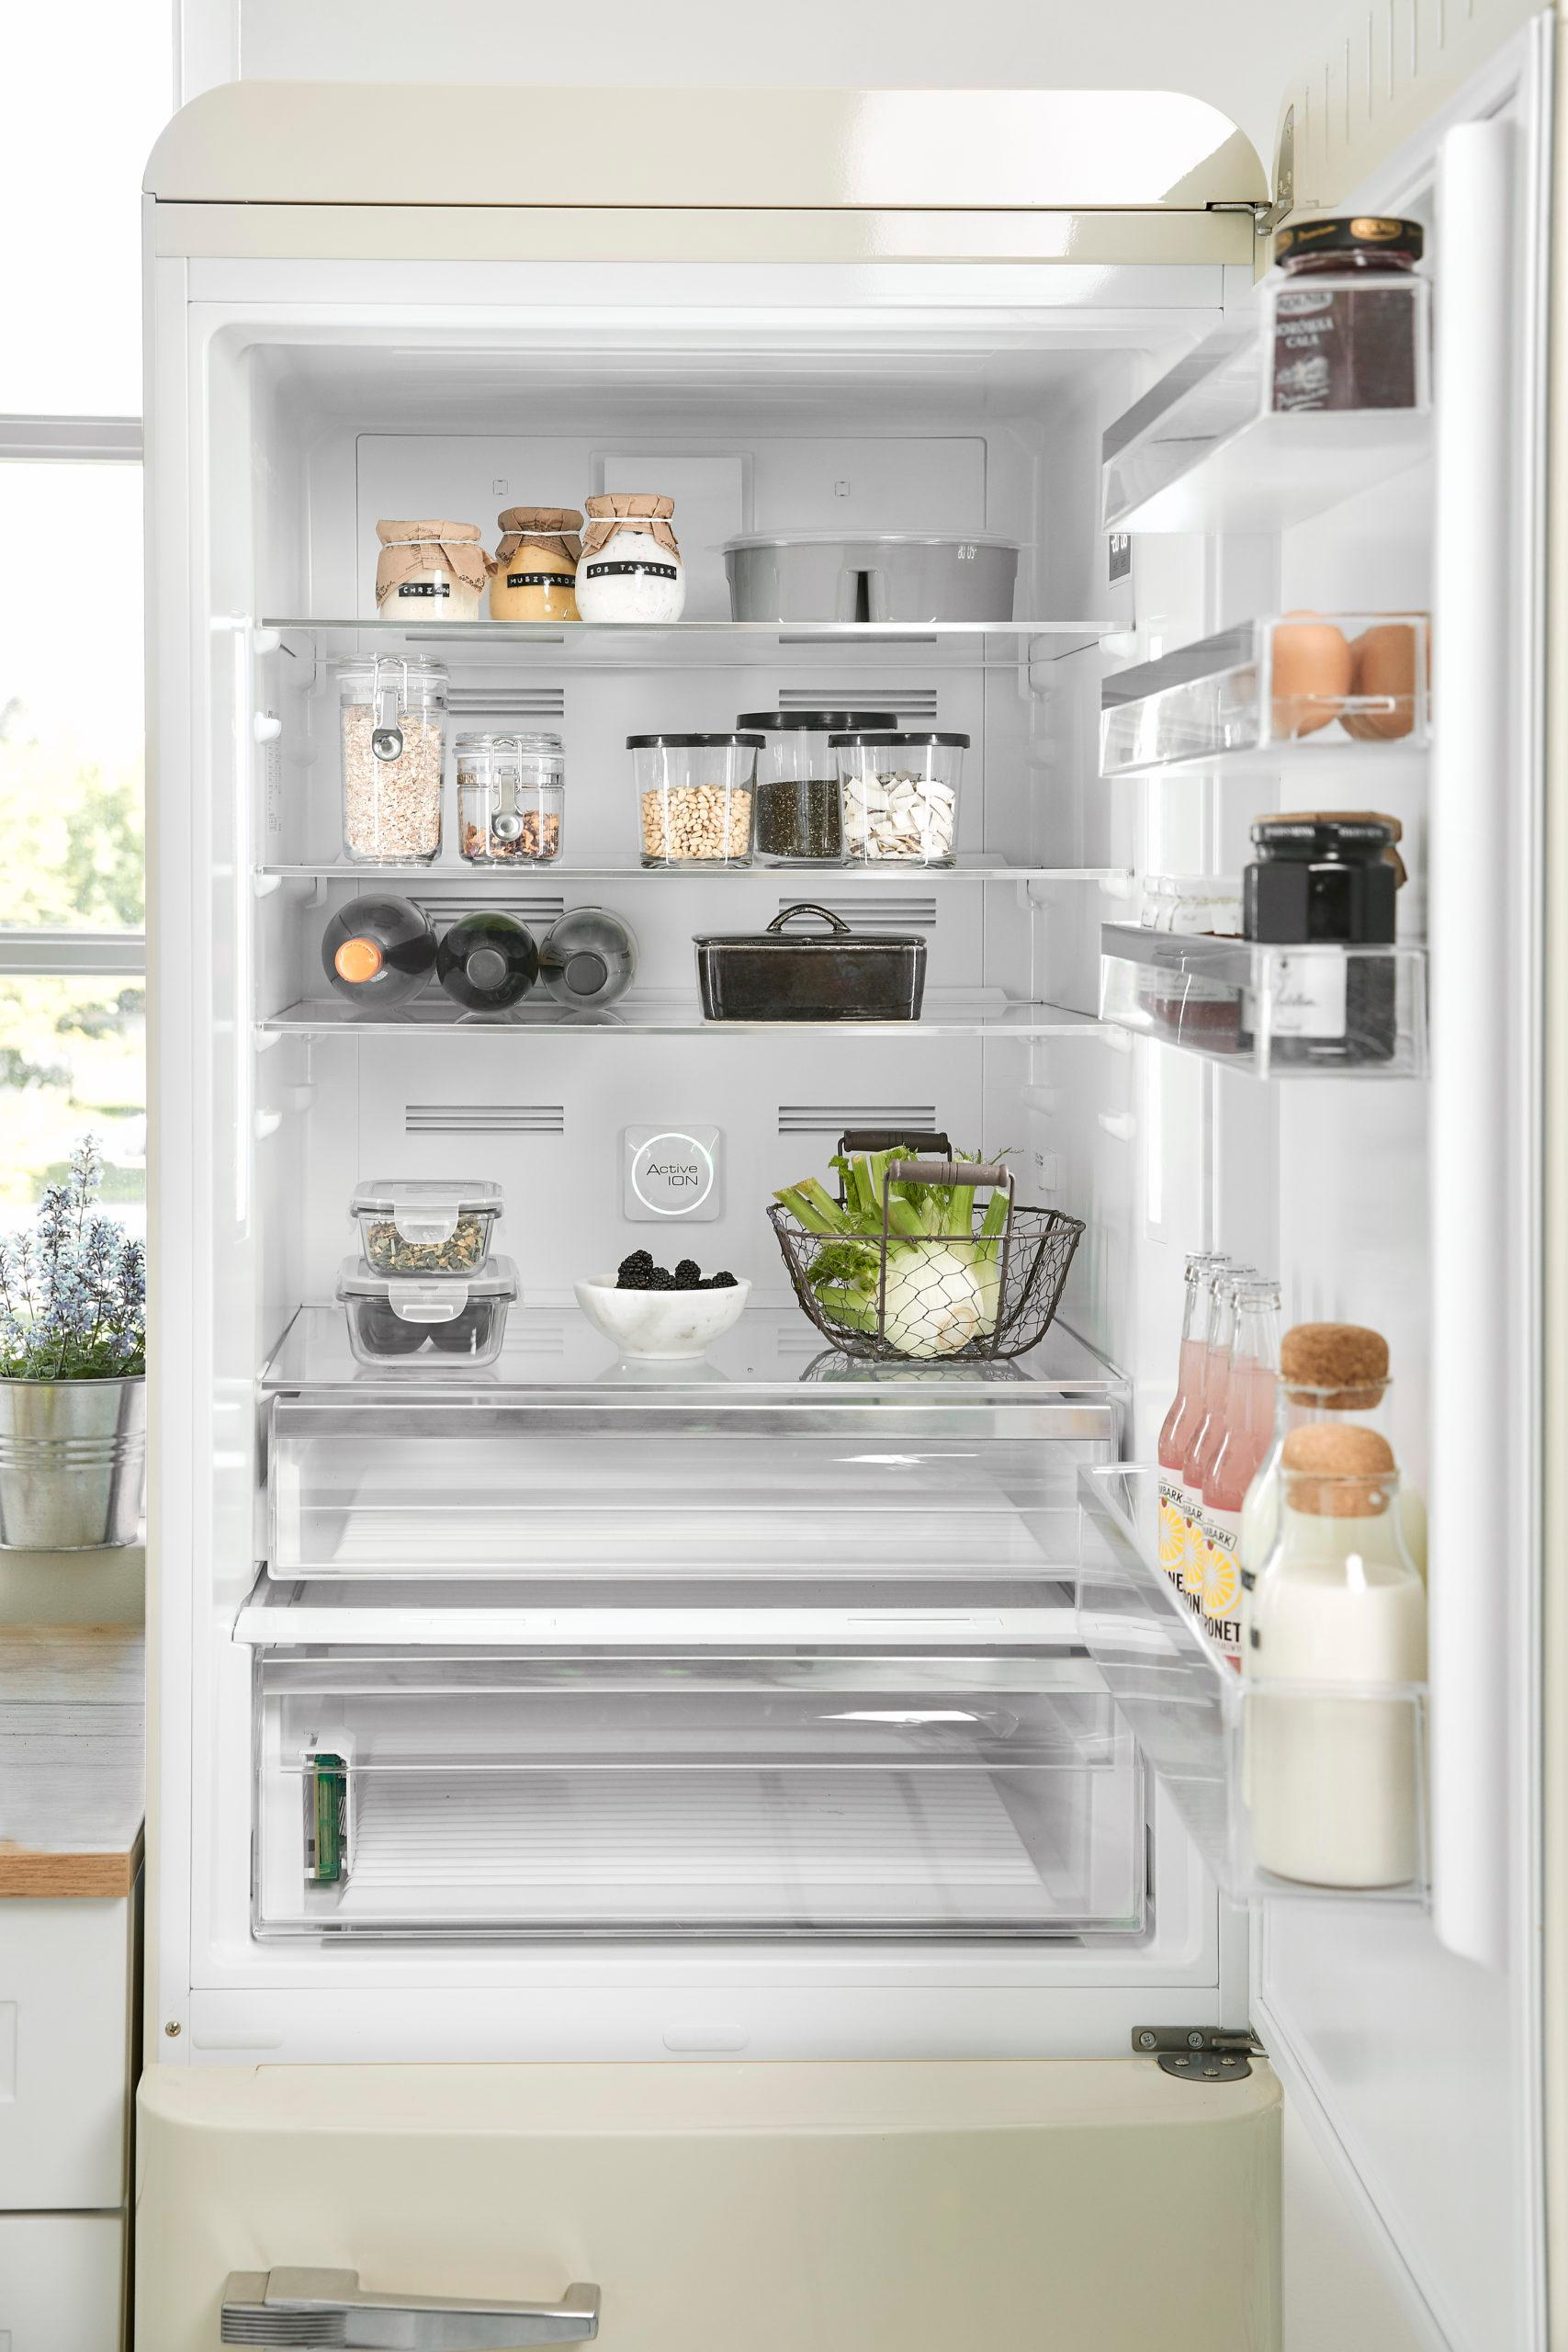 Witte smeg koelkast in opgeruimde lichte keuken